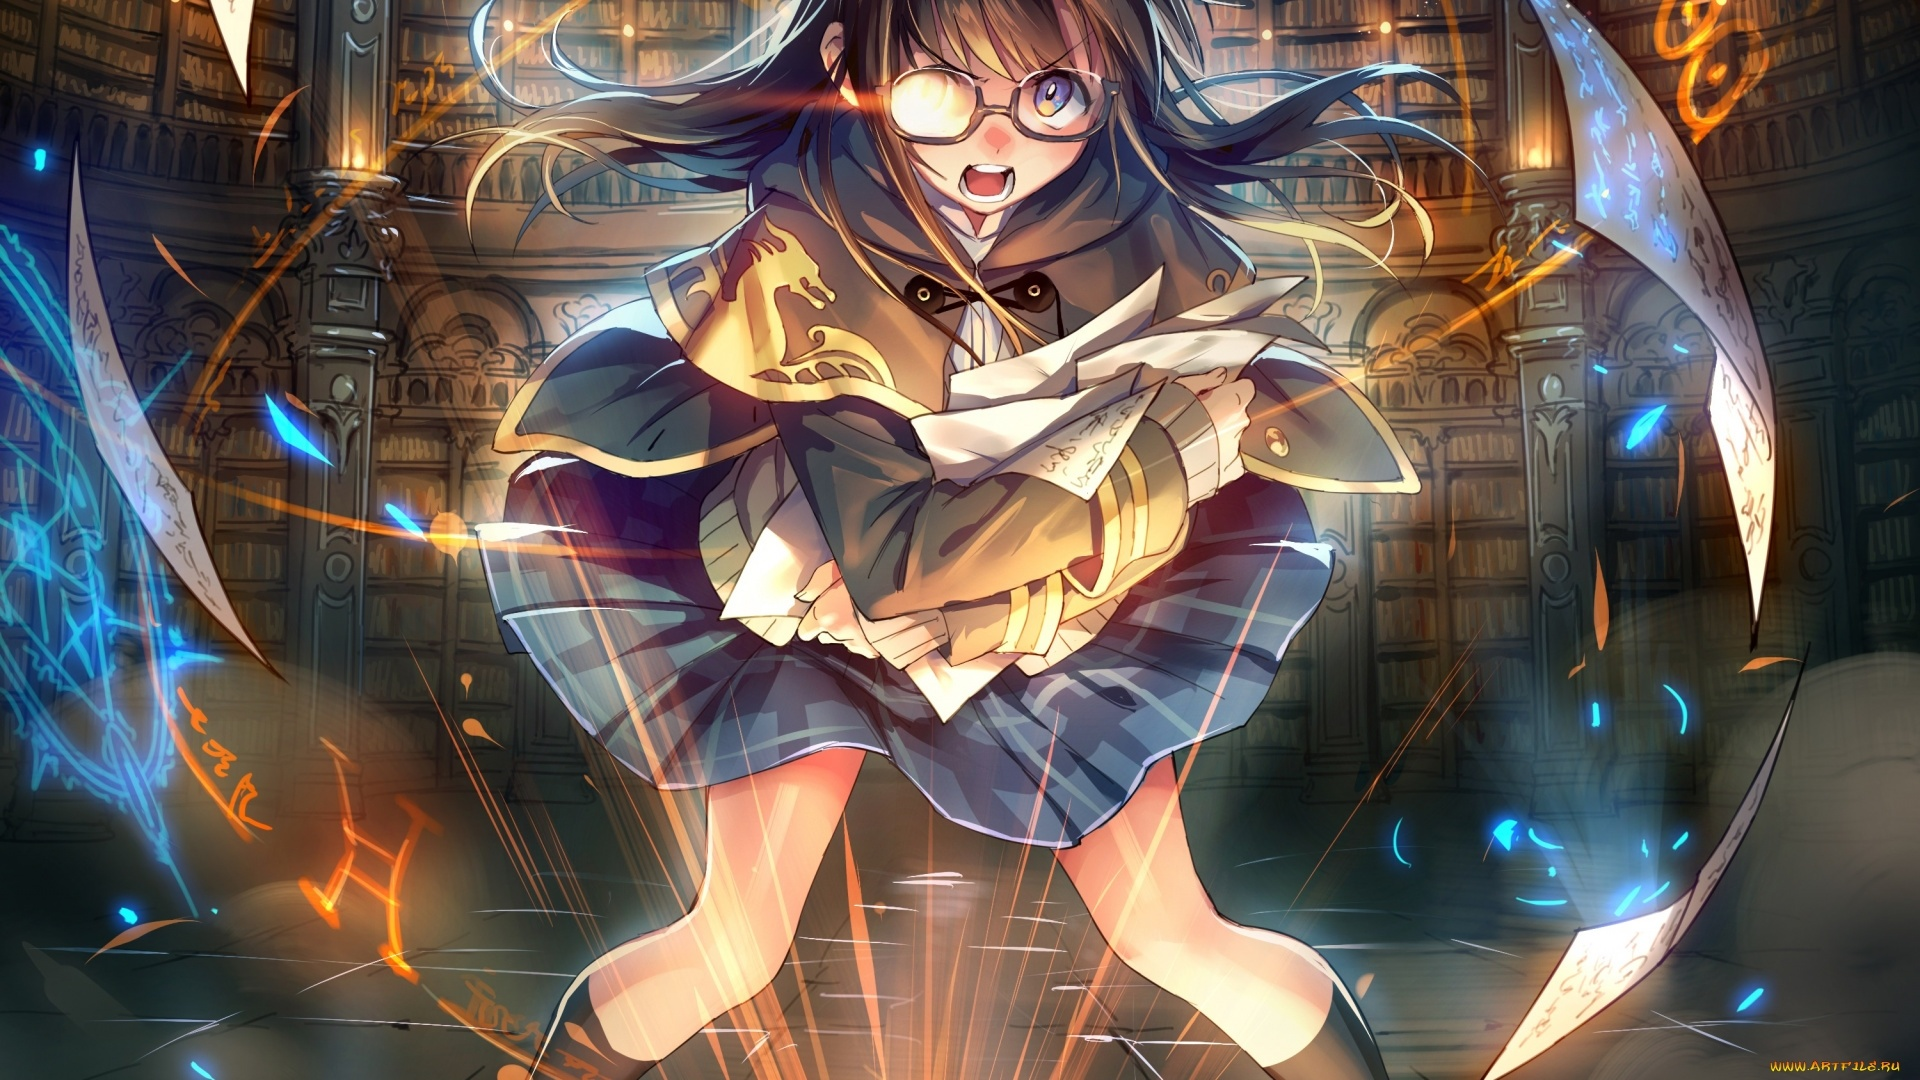 Anime Girl Magician desktop wallpaper hd